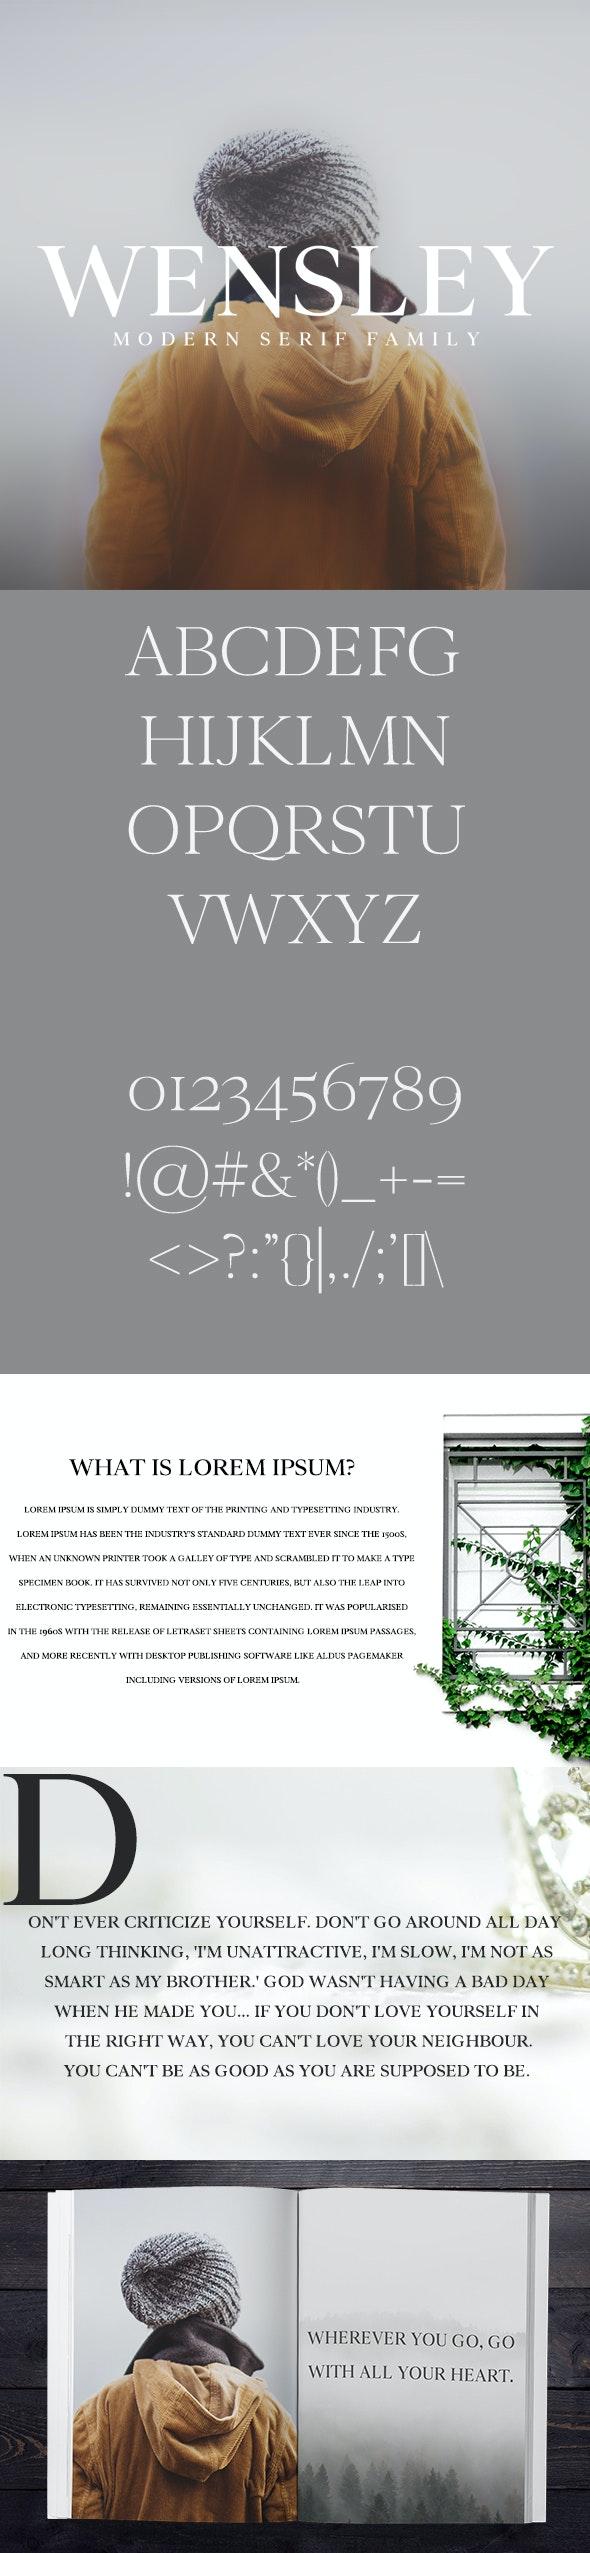 Wensley Modern Serif Font Family - Serif Fonts